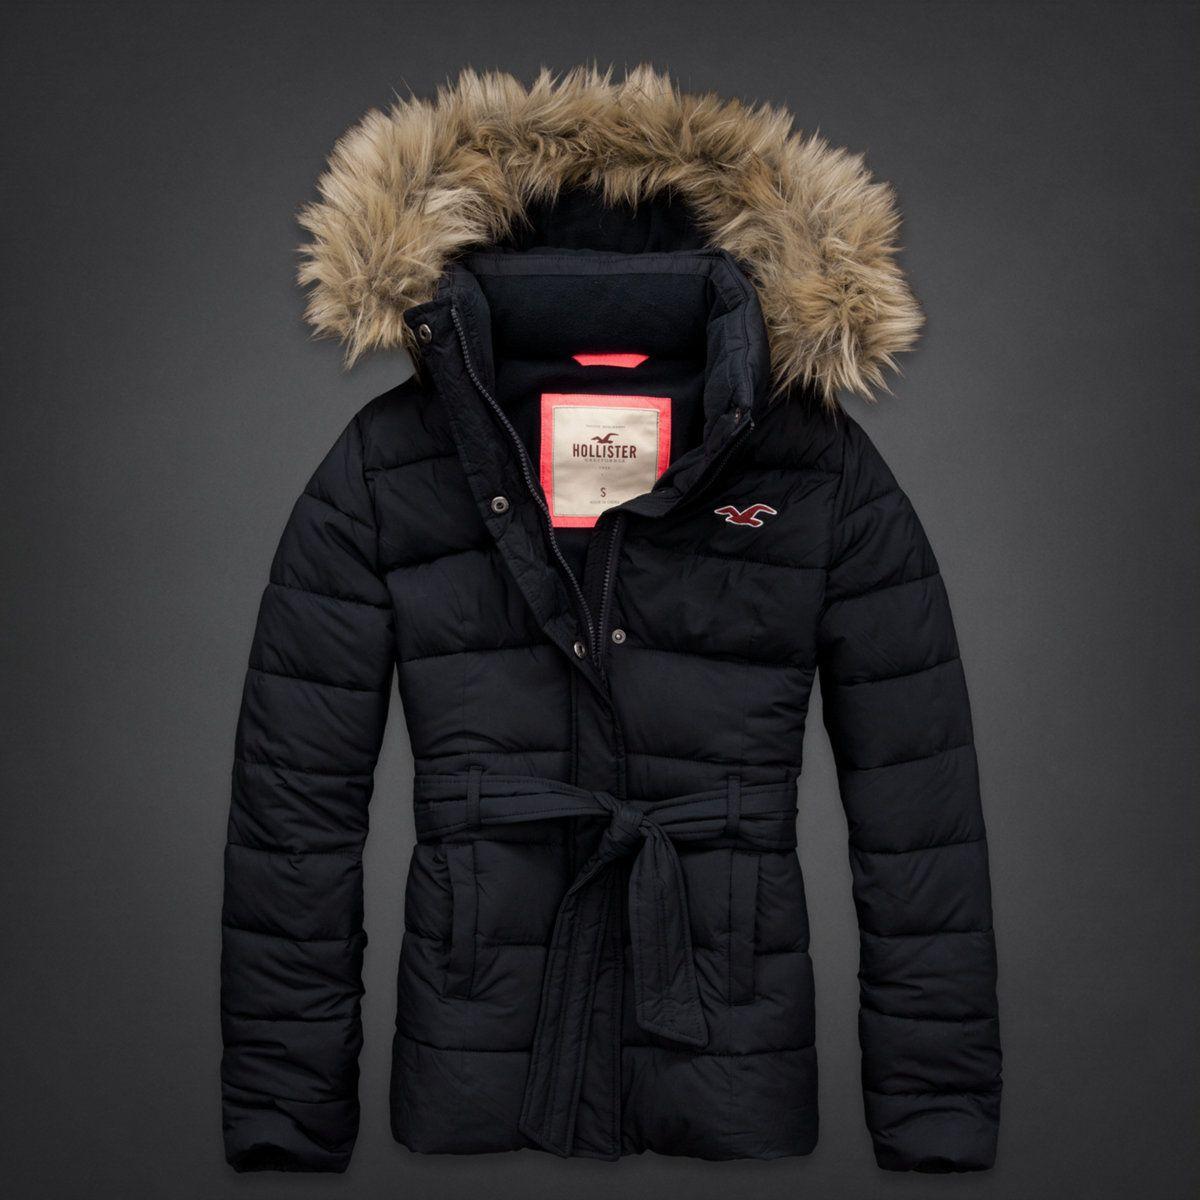 Hollister Parka Walking Outfits Hollister Parka Winter Jackets [ 1200 x 1200 Pixel ]